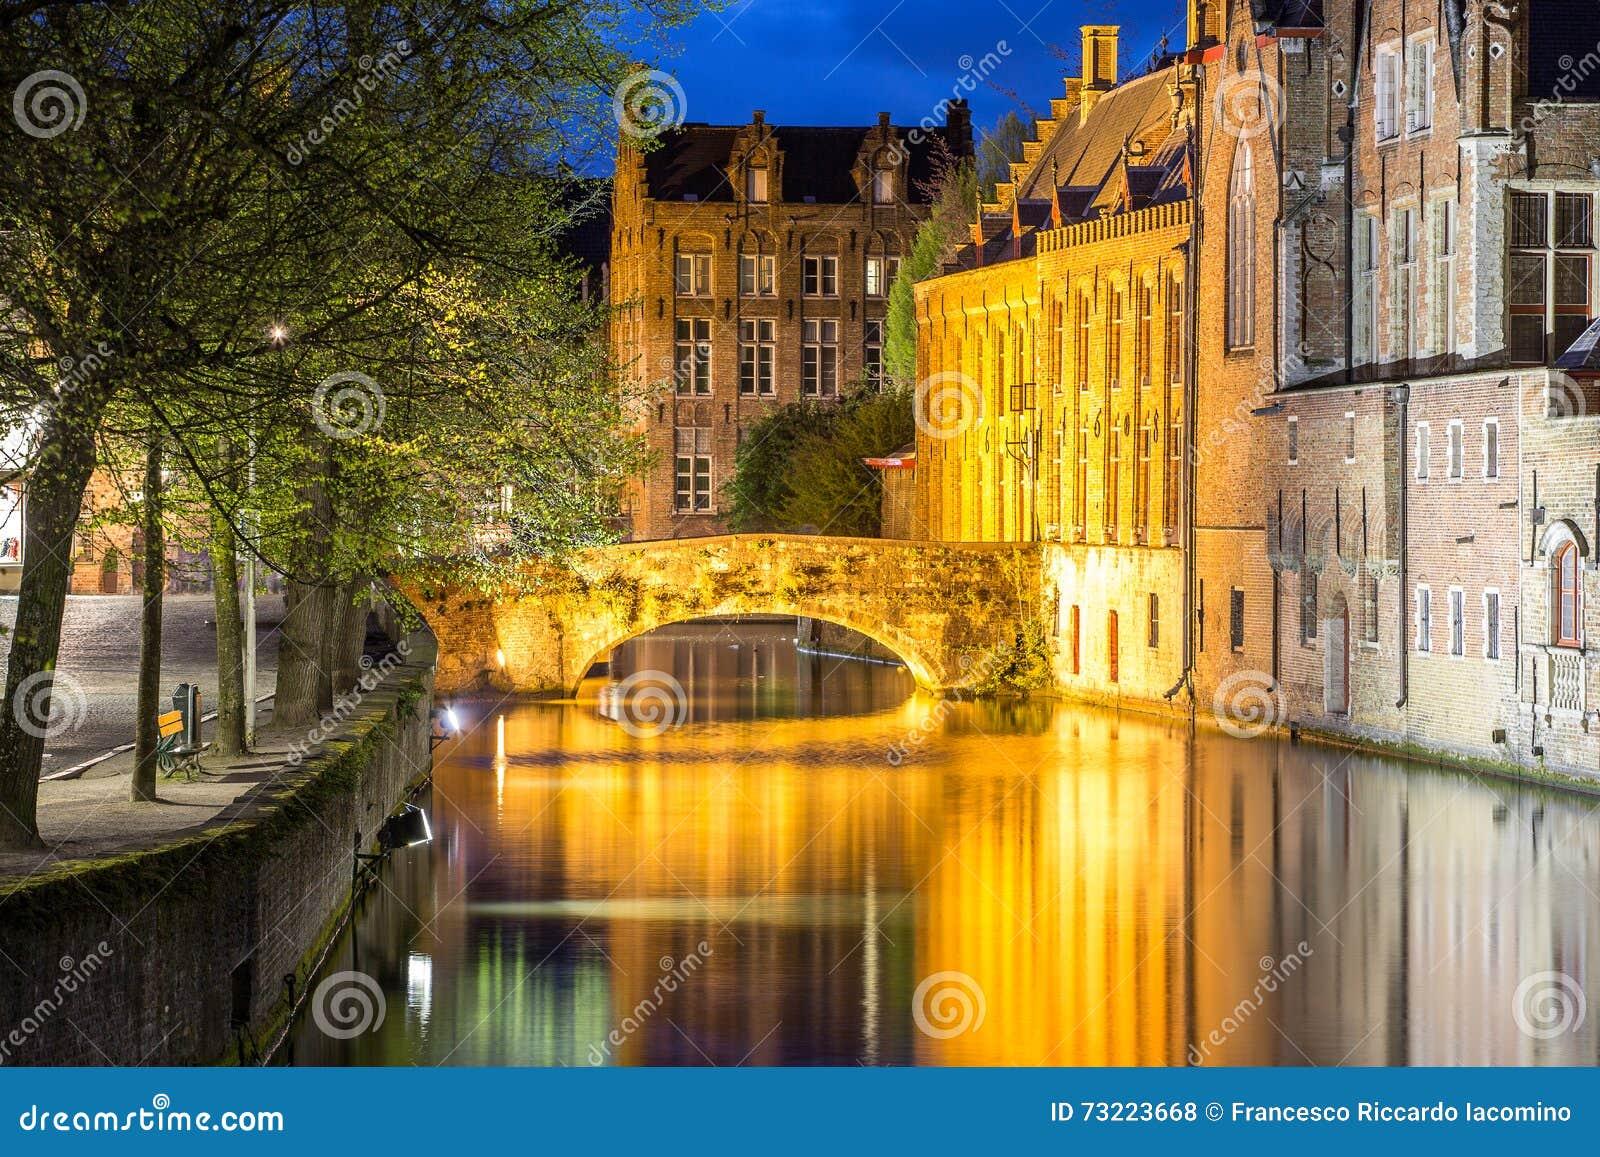 Bruges, case e canali